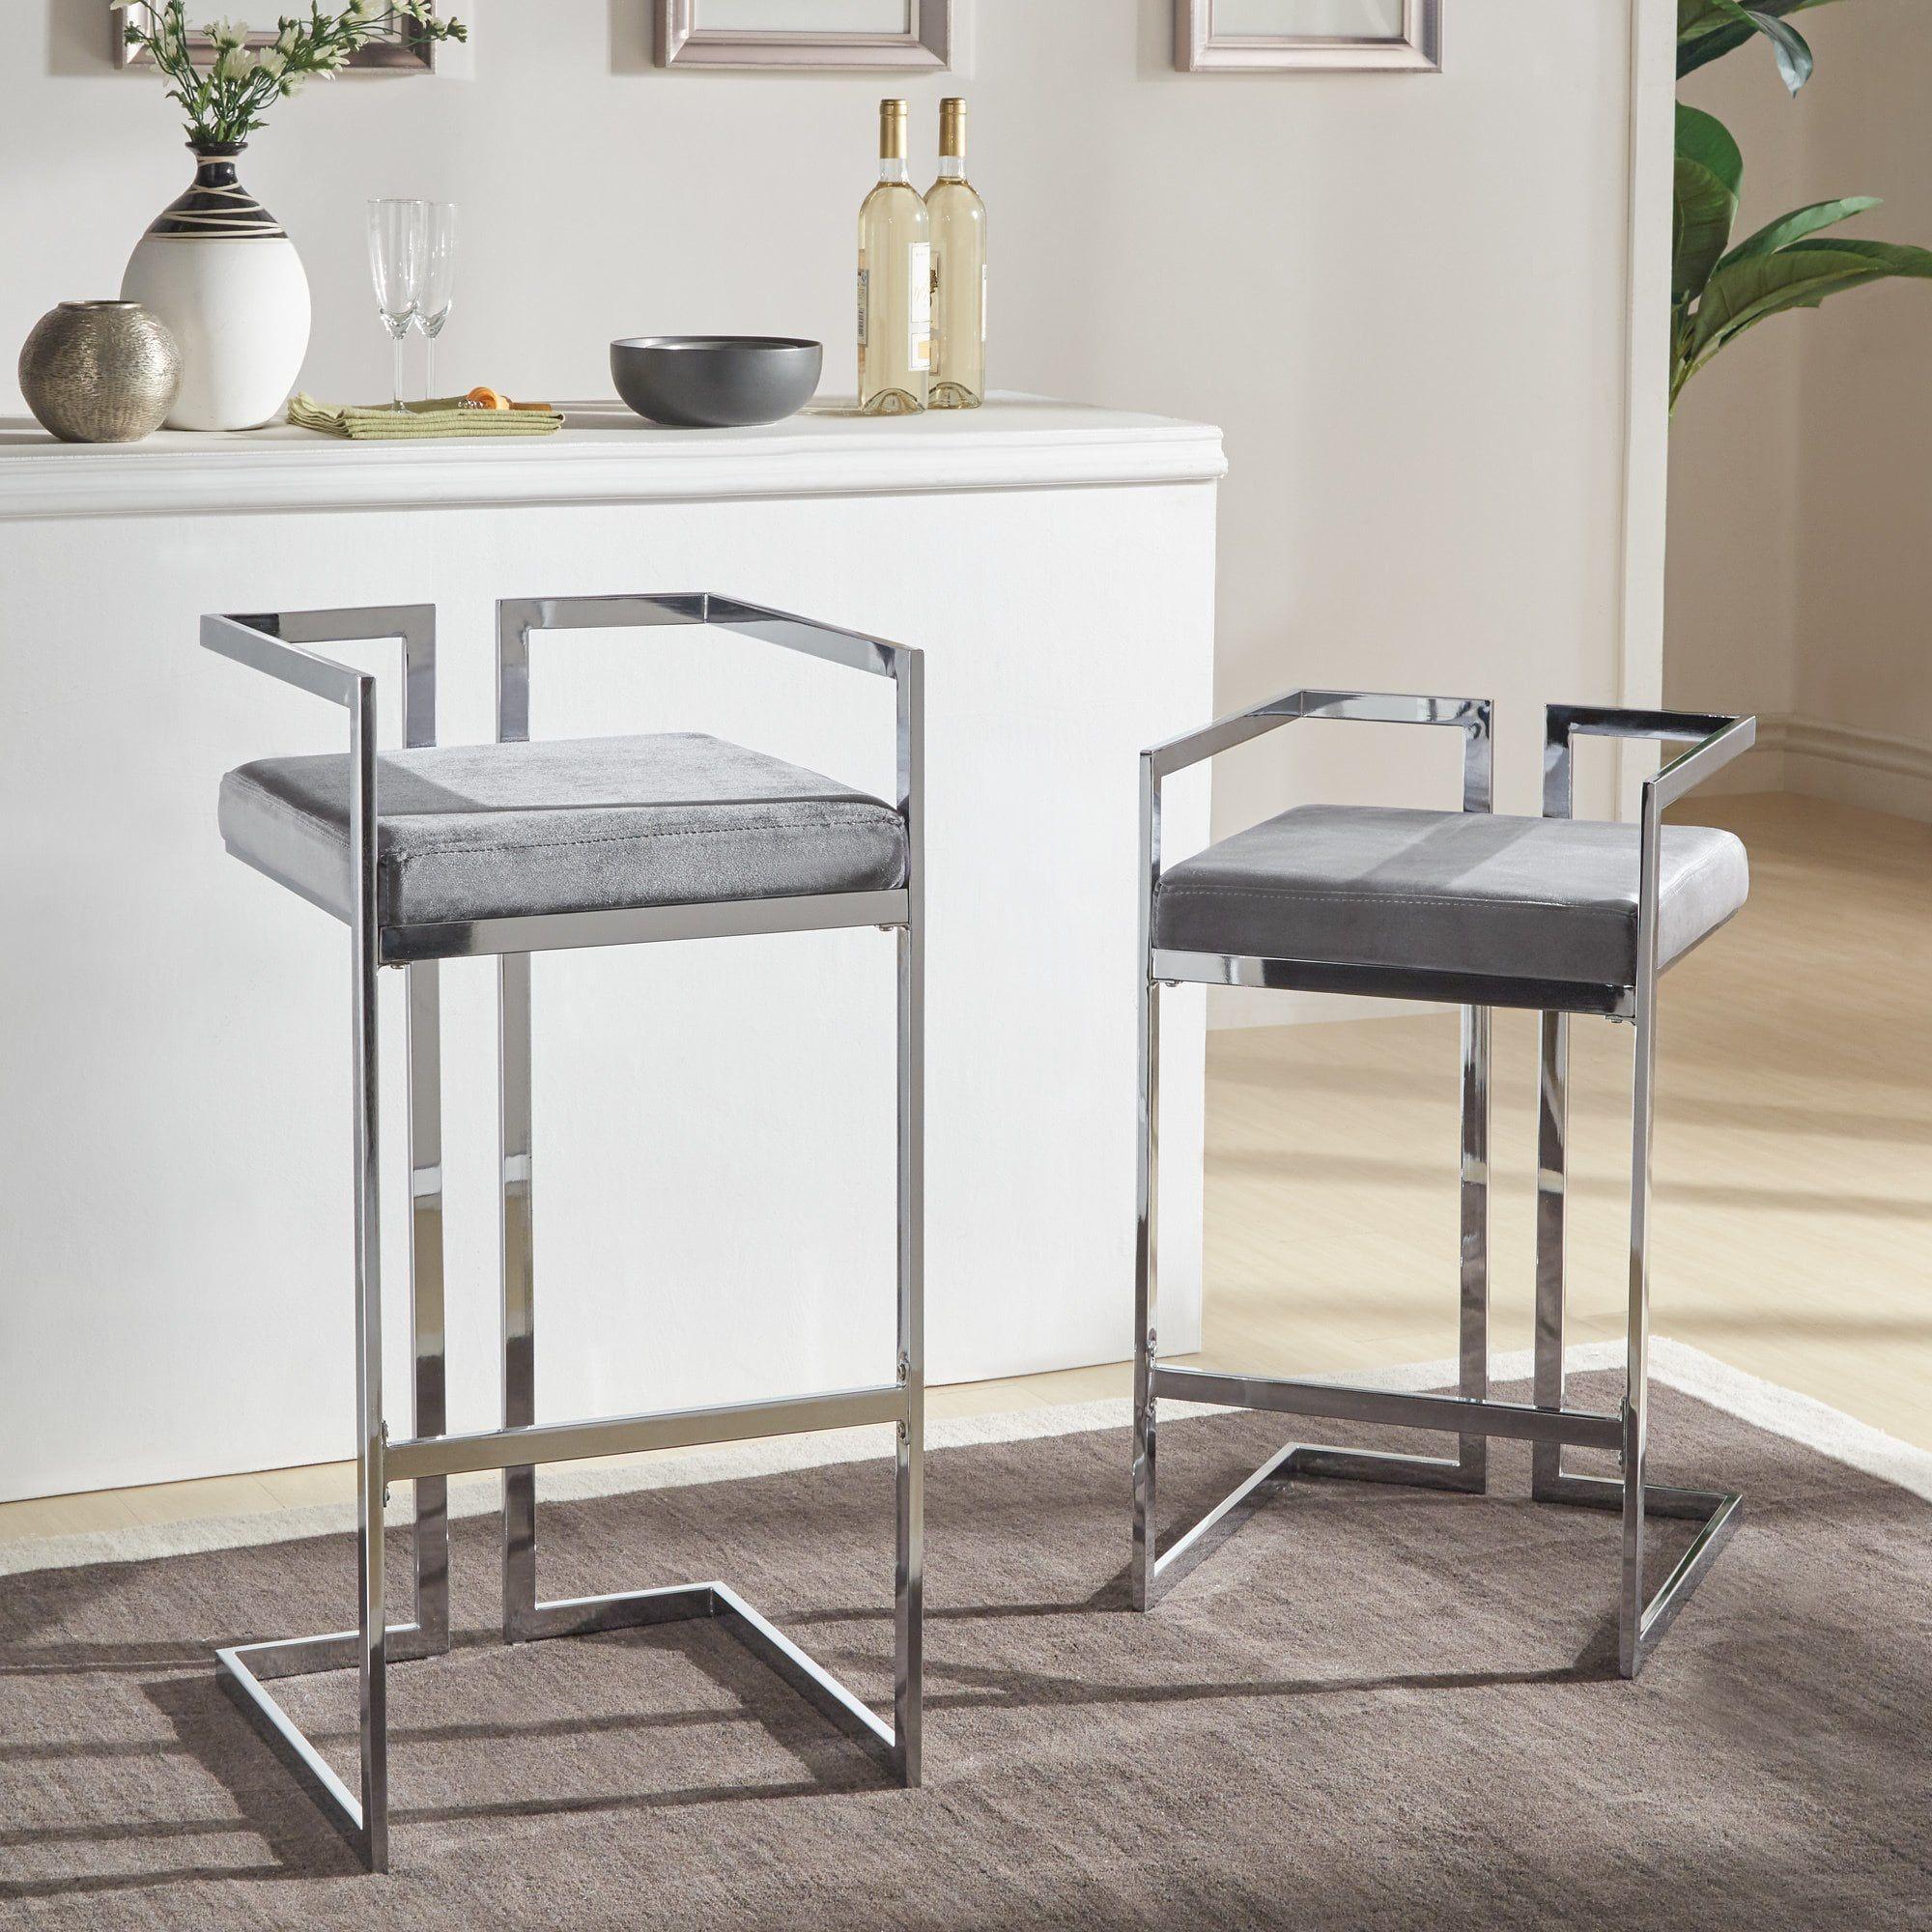 10 Comfort Chrome Cushioned Bar Stool In Room Design Ideas ...